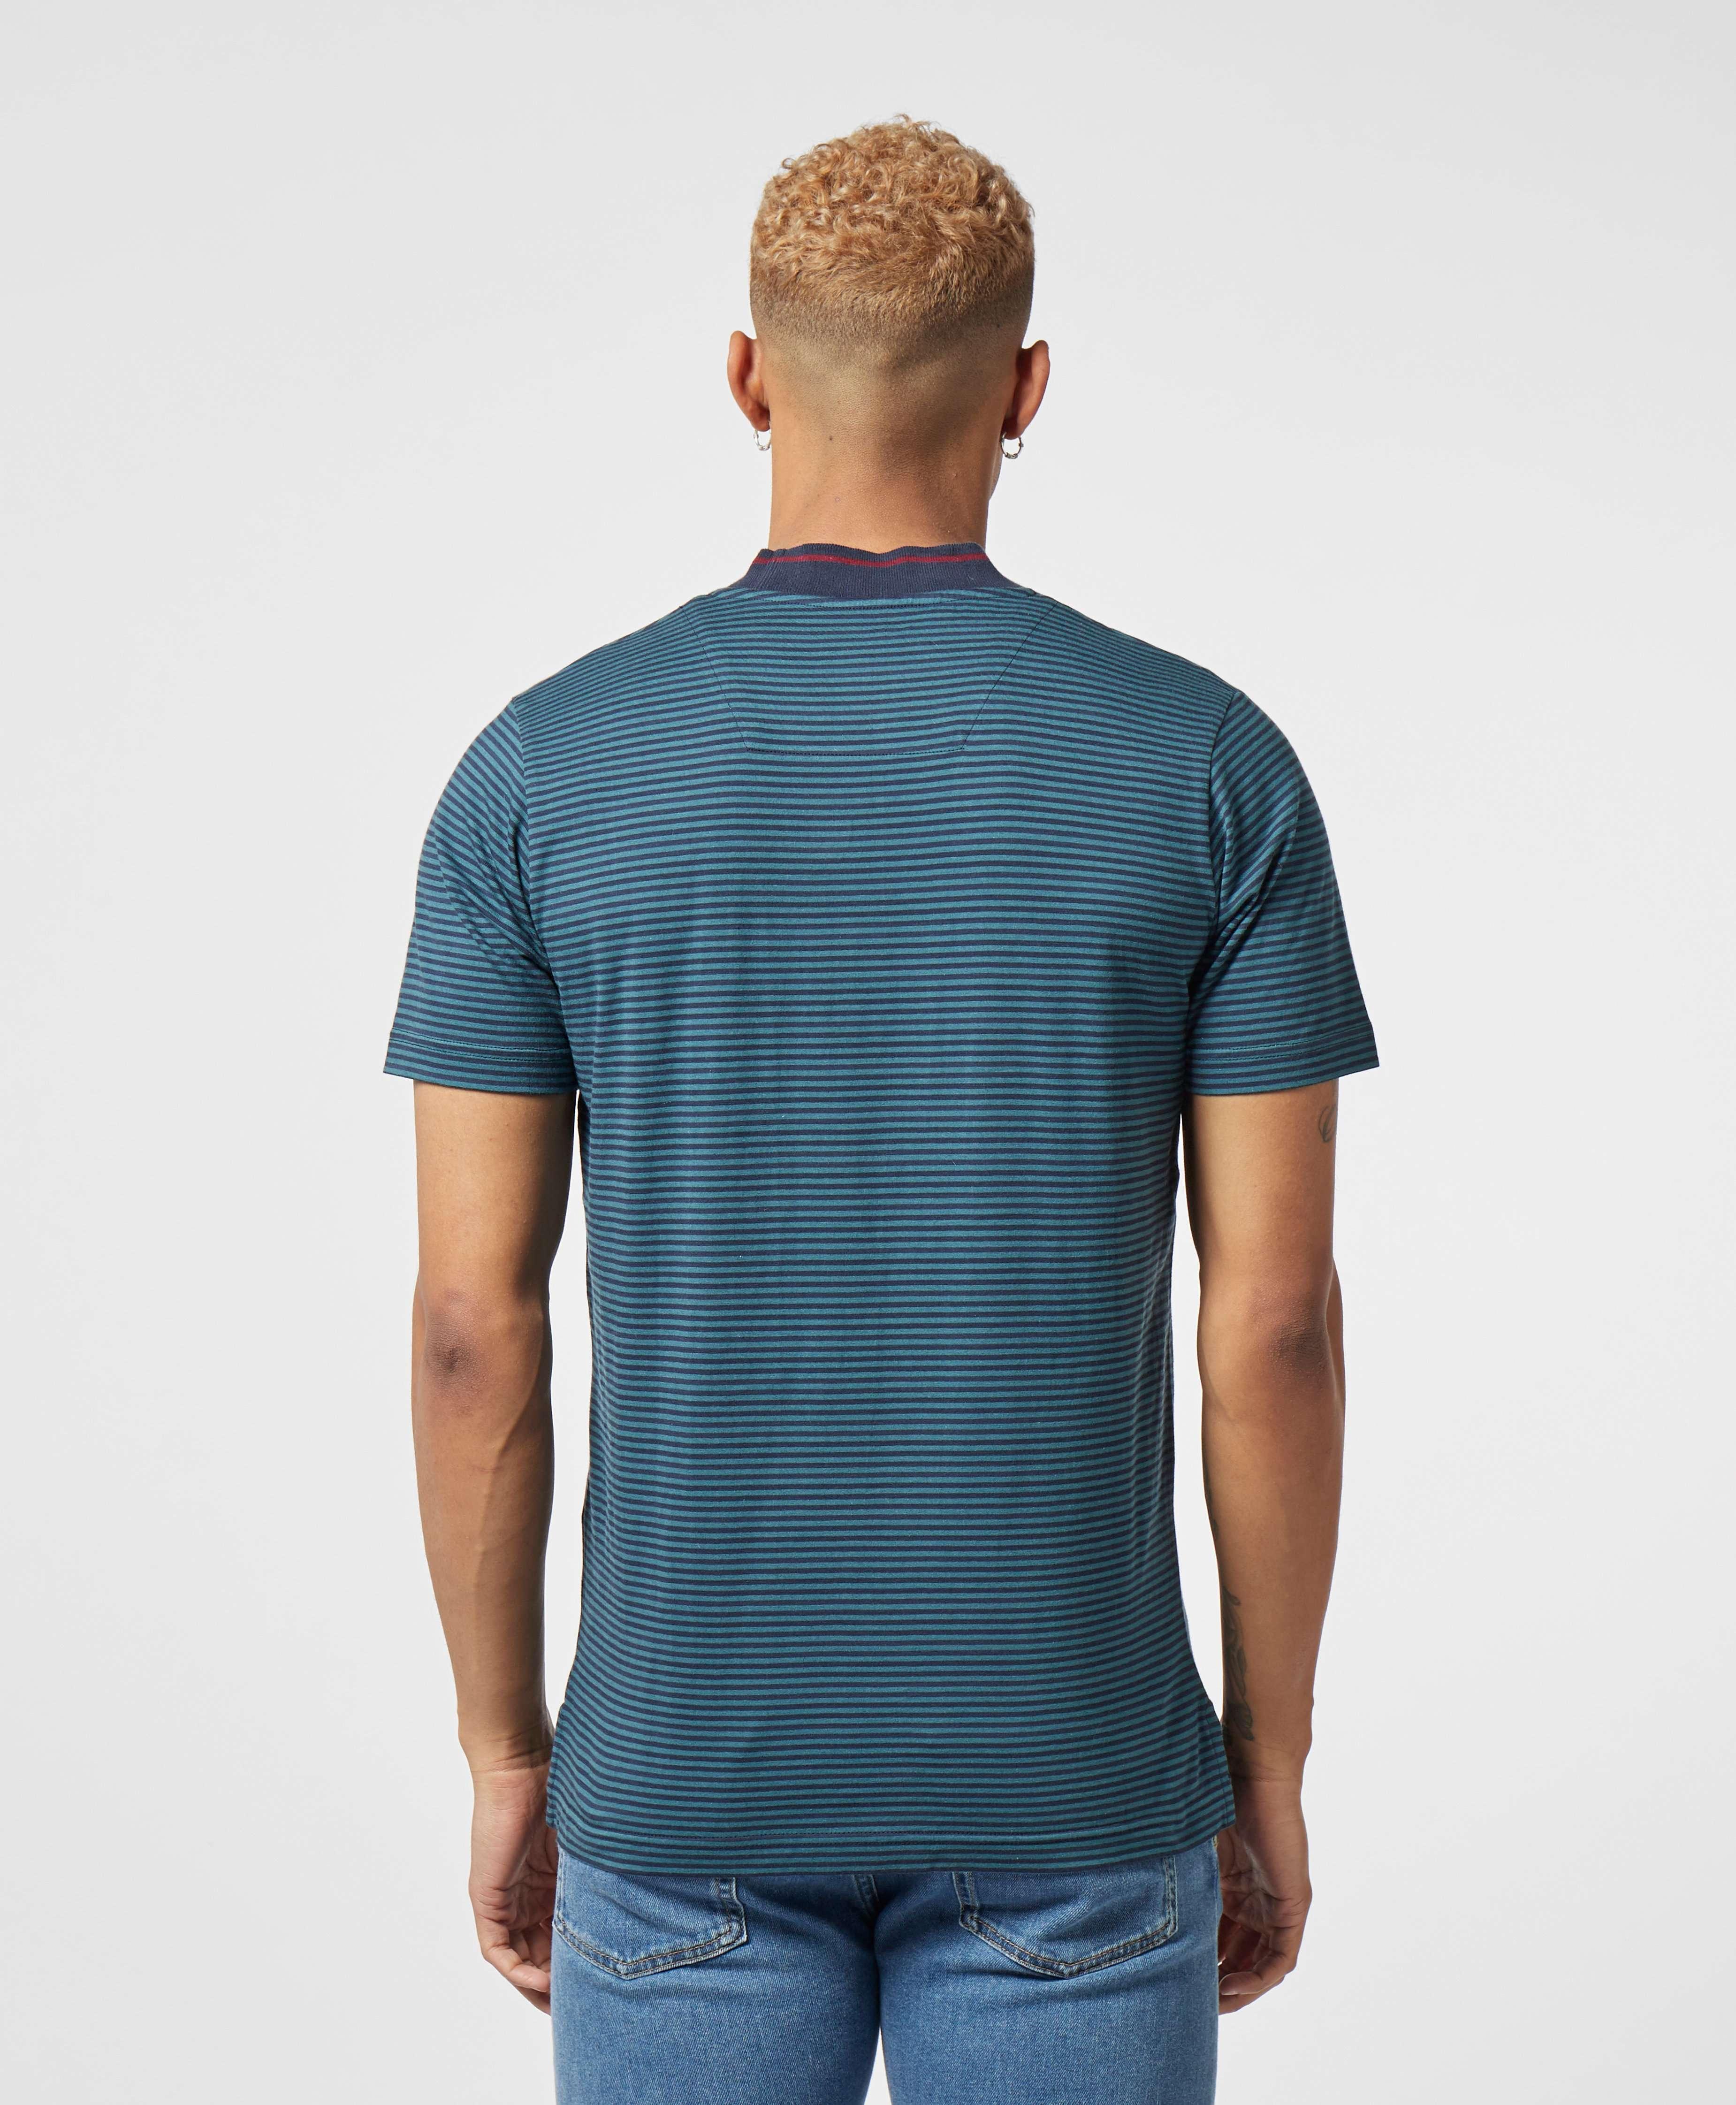 Marshall Artist Mock Stripe Short Sleeve T-Shirt